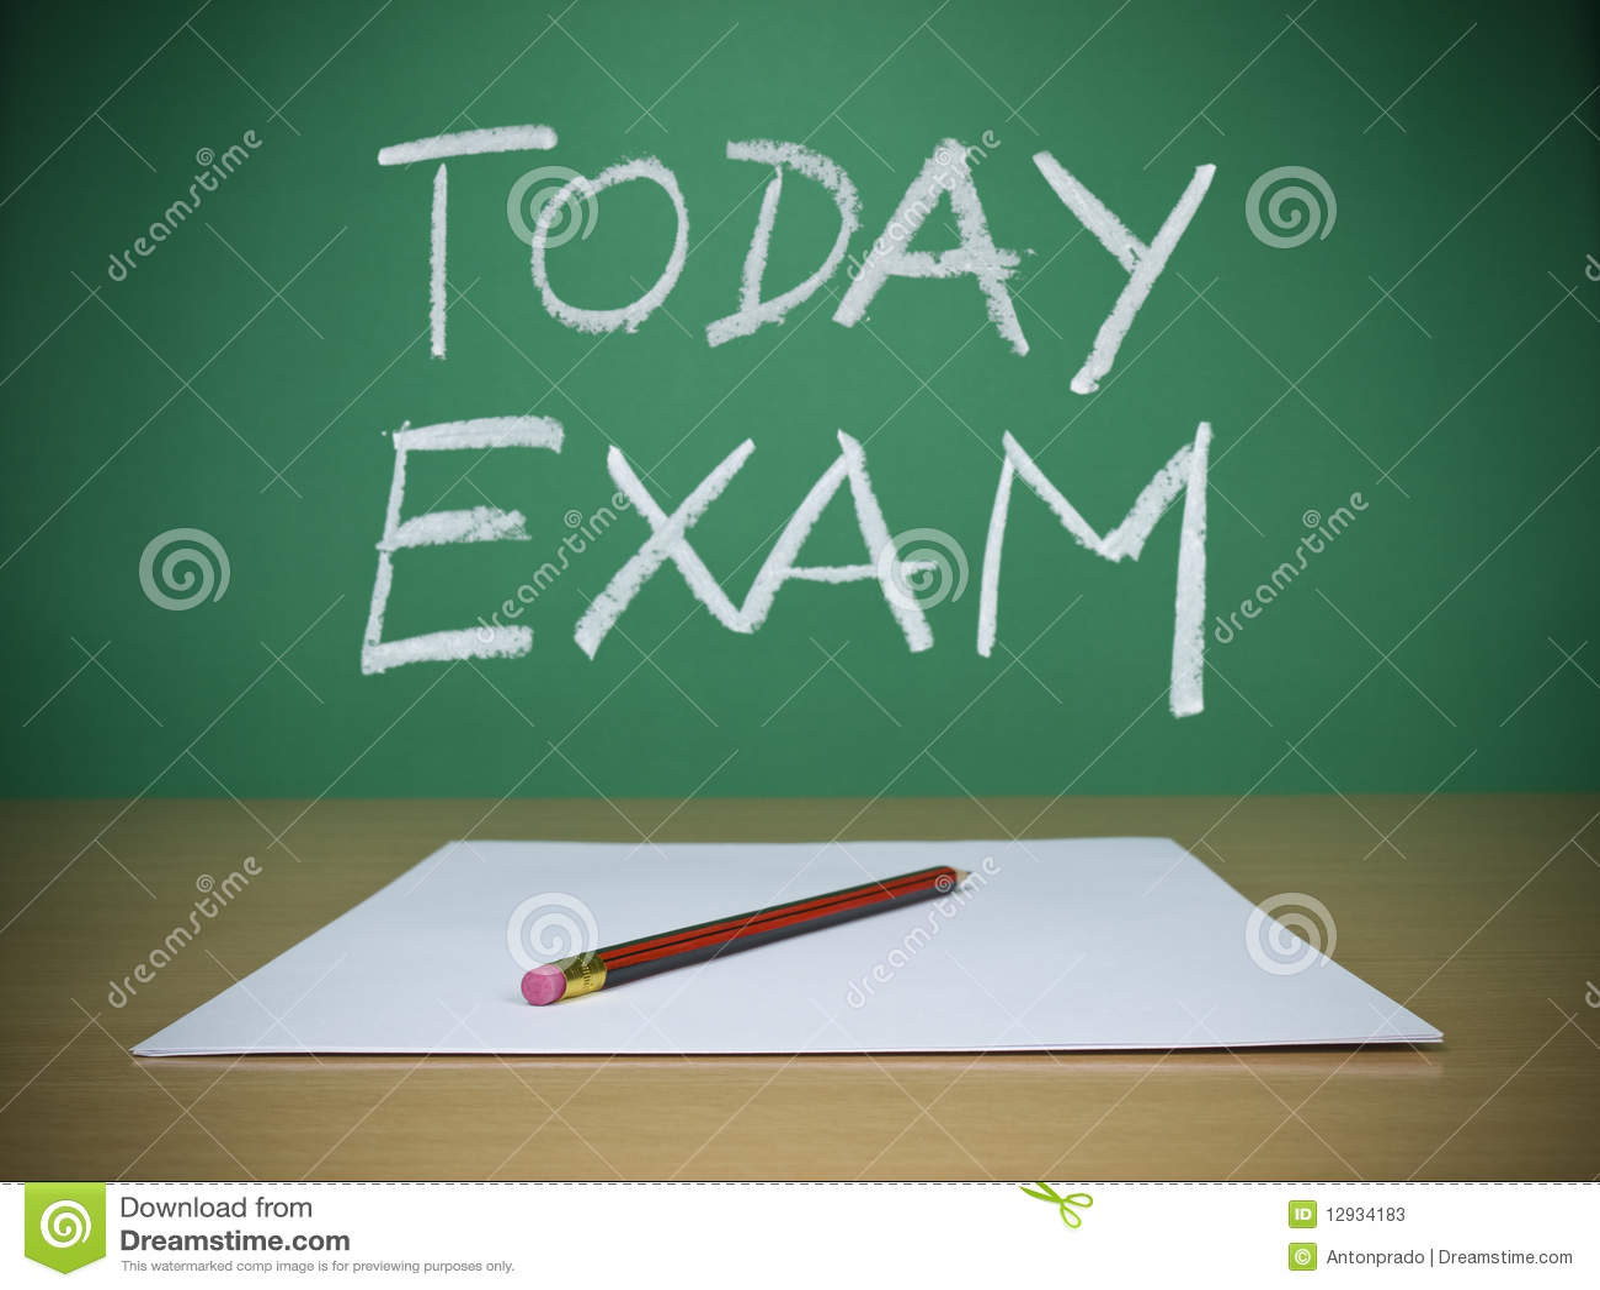 Today Exam Stock Image Image Of Form Desk Exam Educate